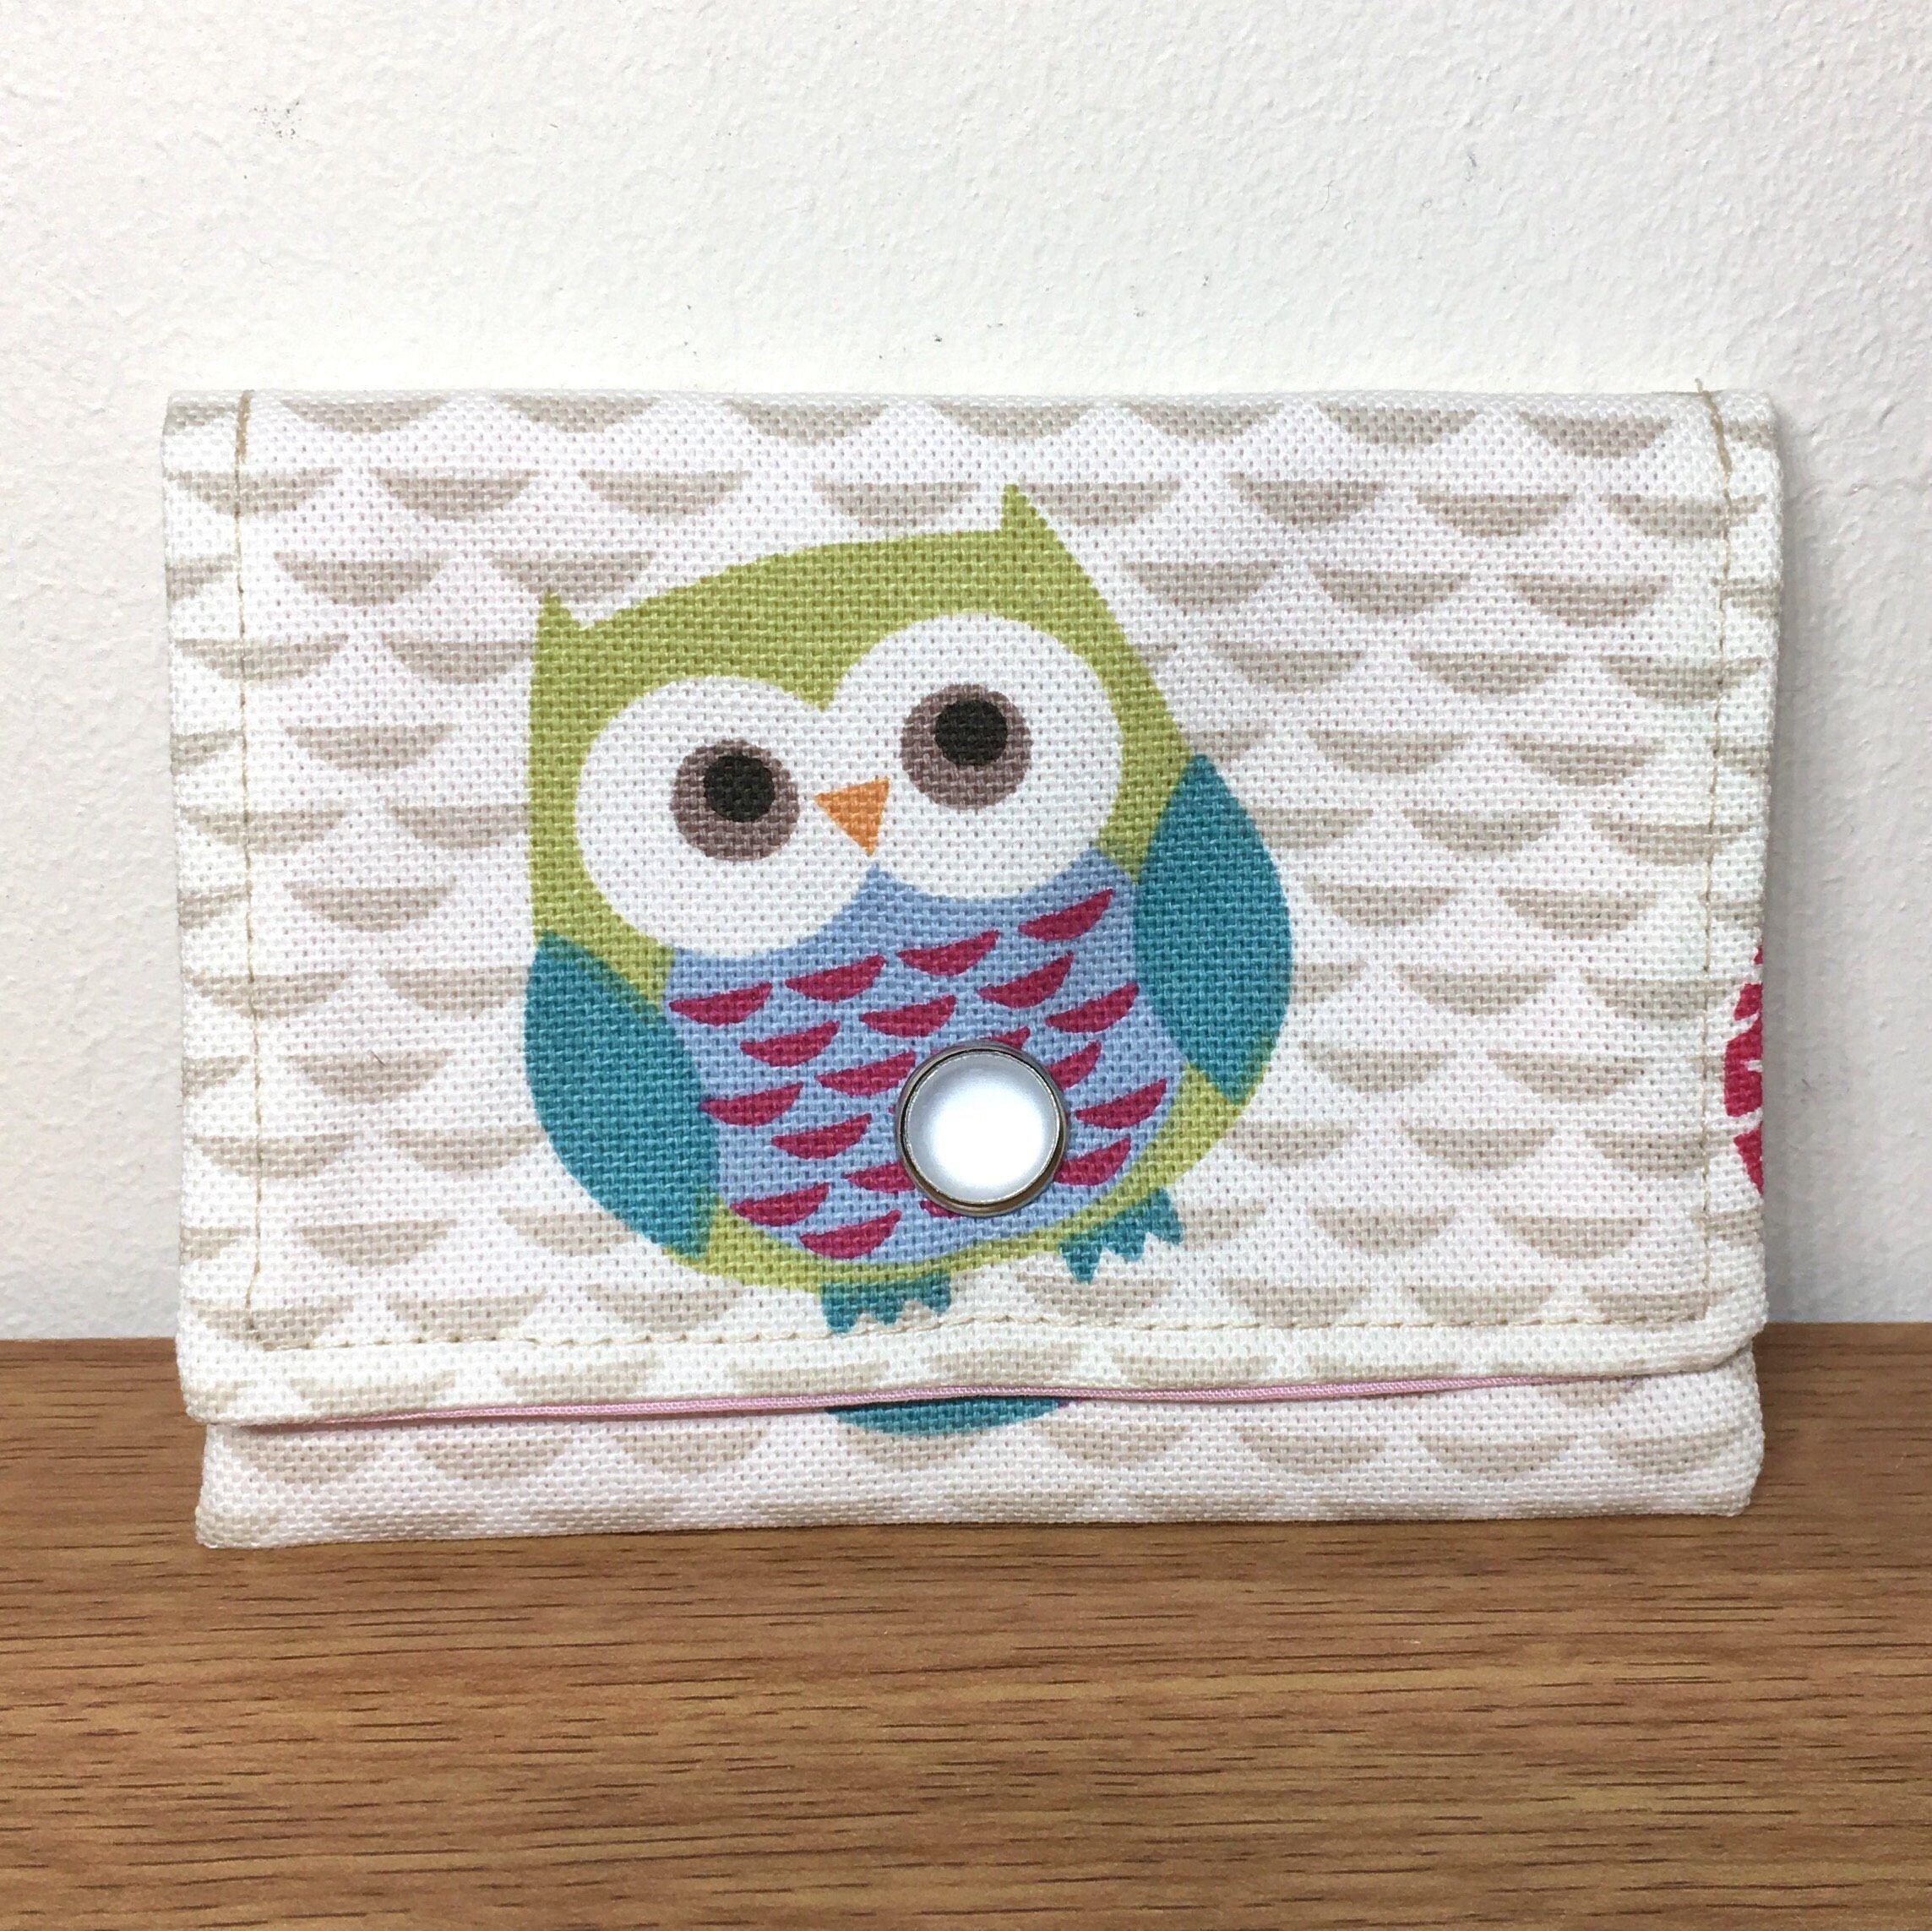 Cute little owl snap closure purse handy for keeping change bank cute little owl snap closure purse handy for keeping change bank cards and business colourmoves